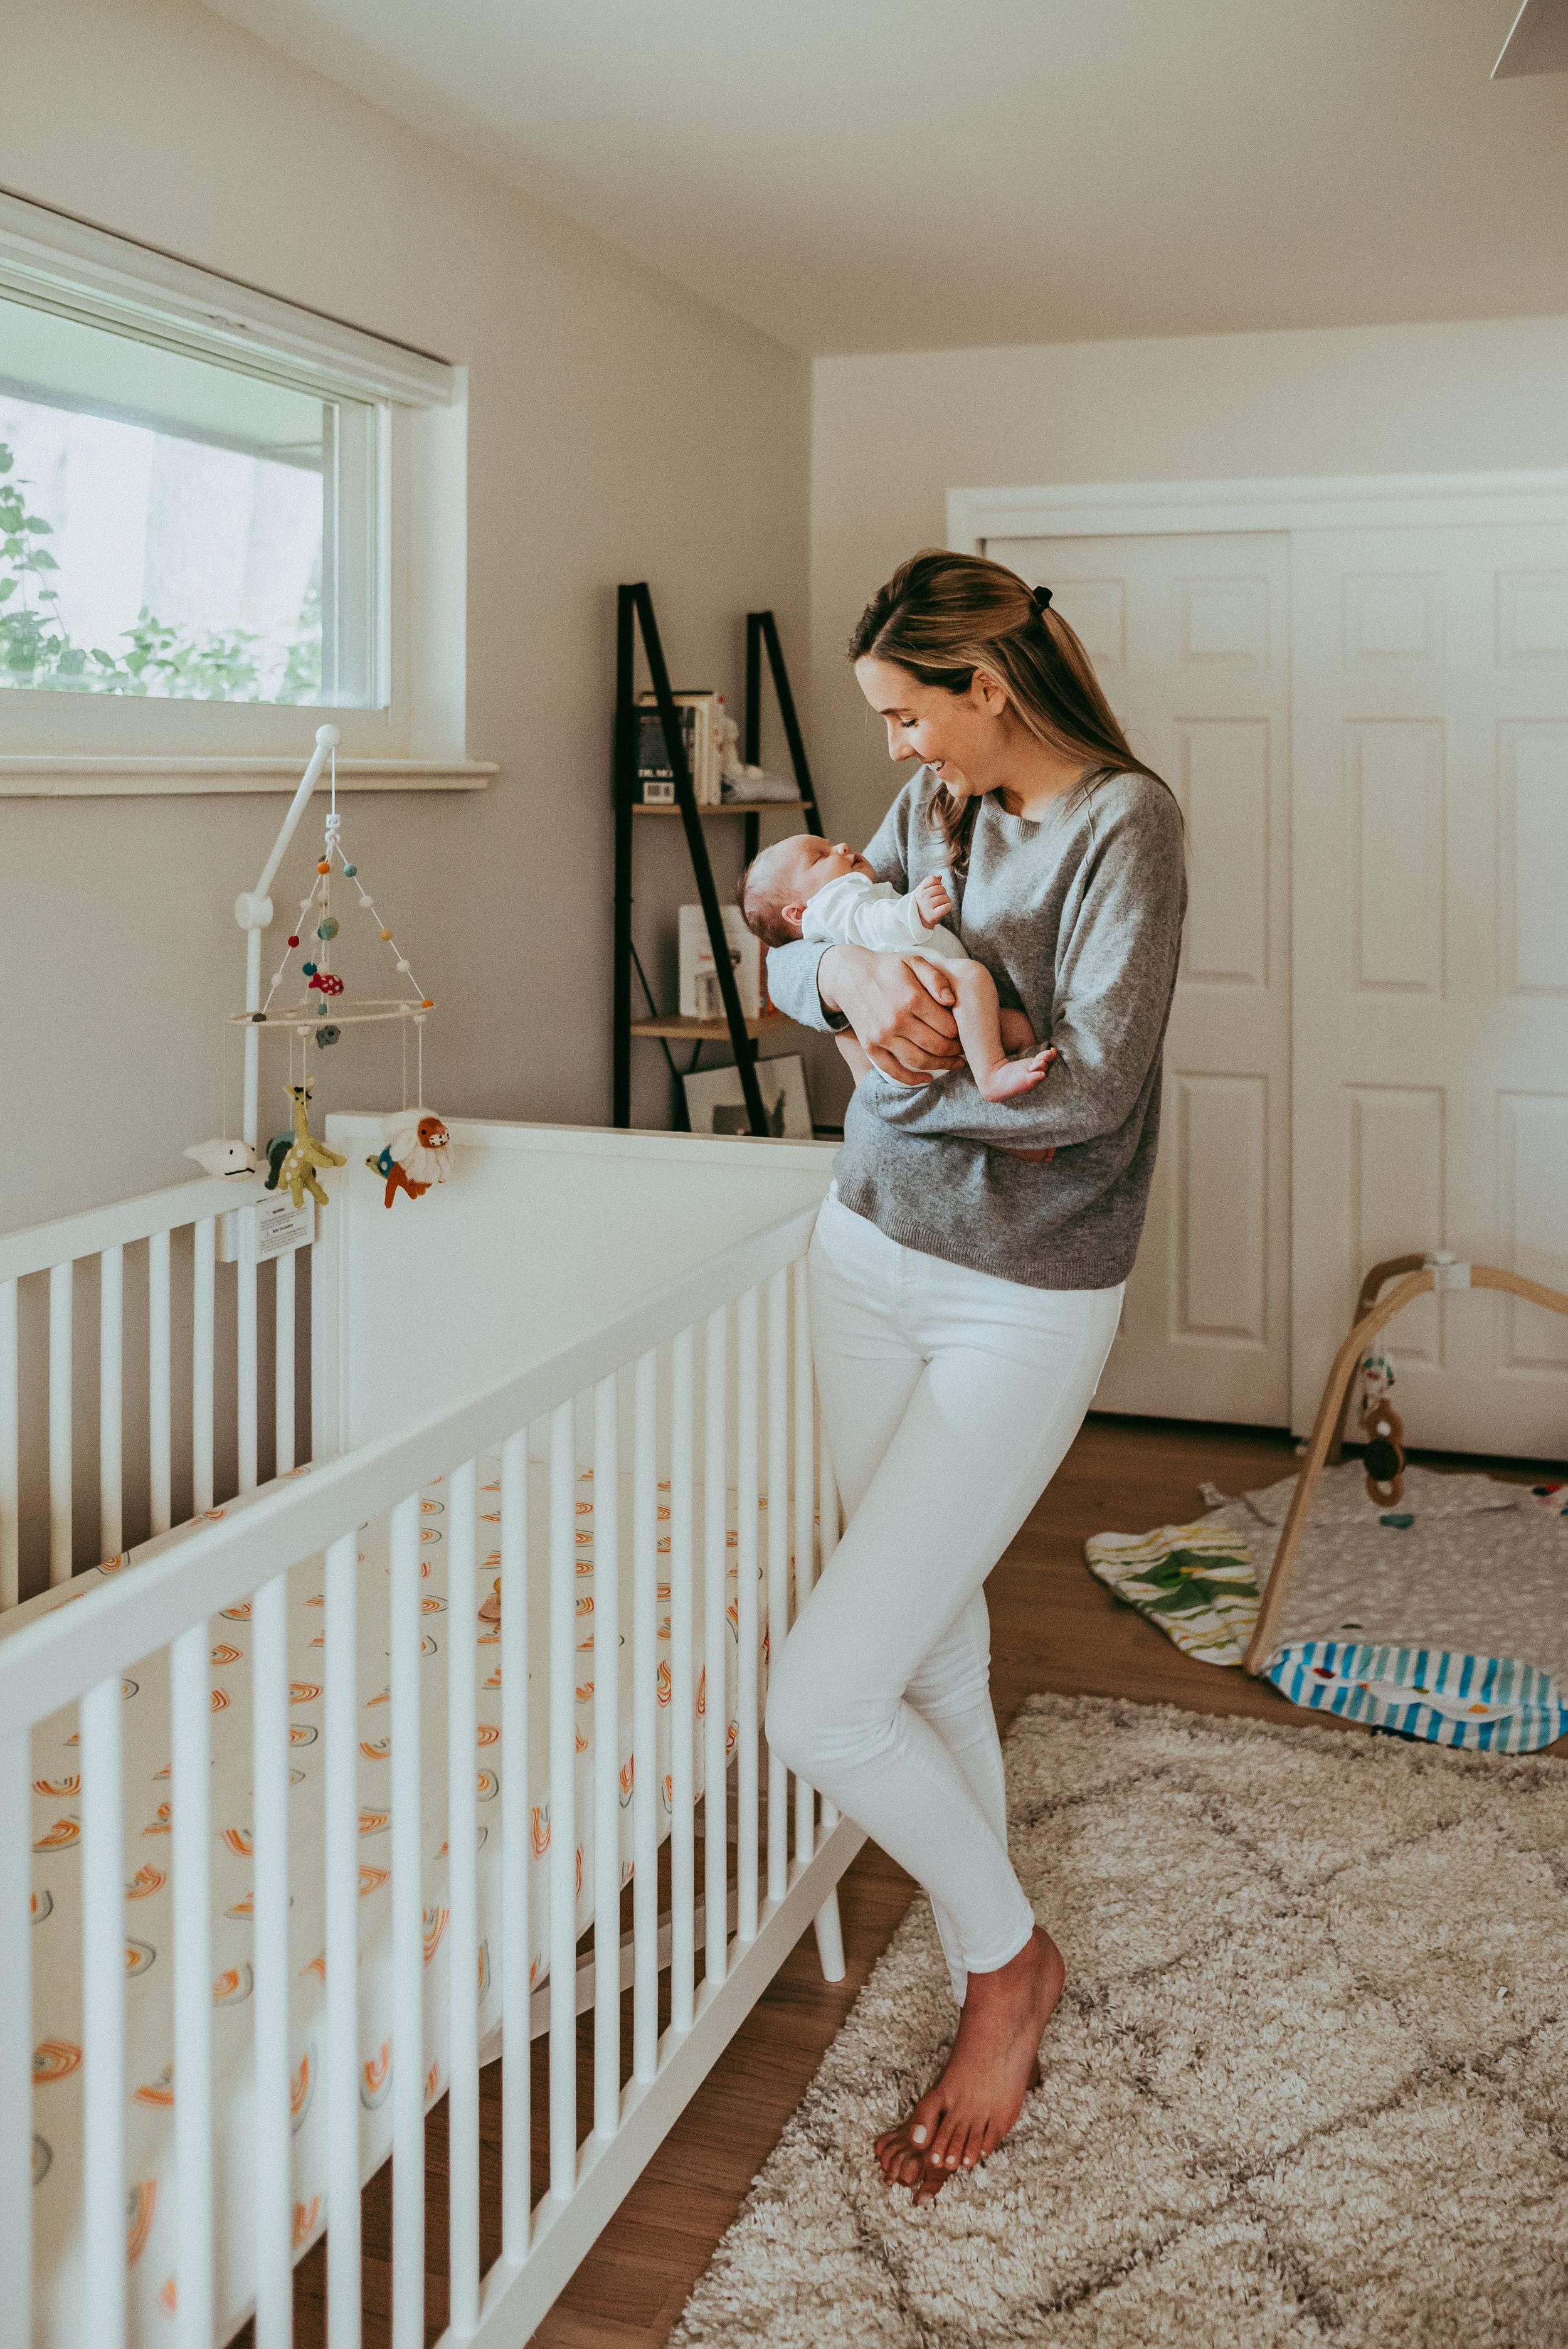 BabyKate_StoriedPhotography_2019-44.jpg